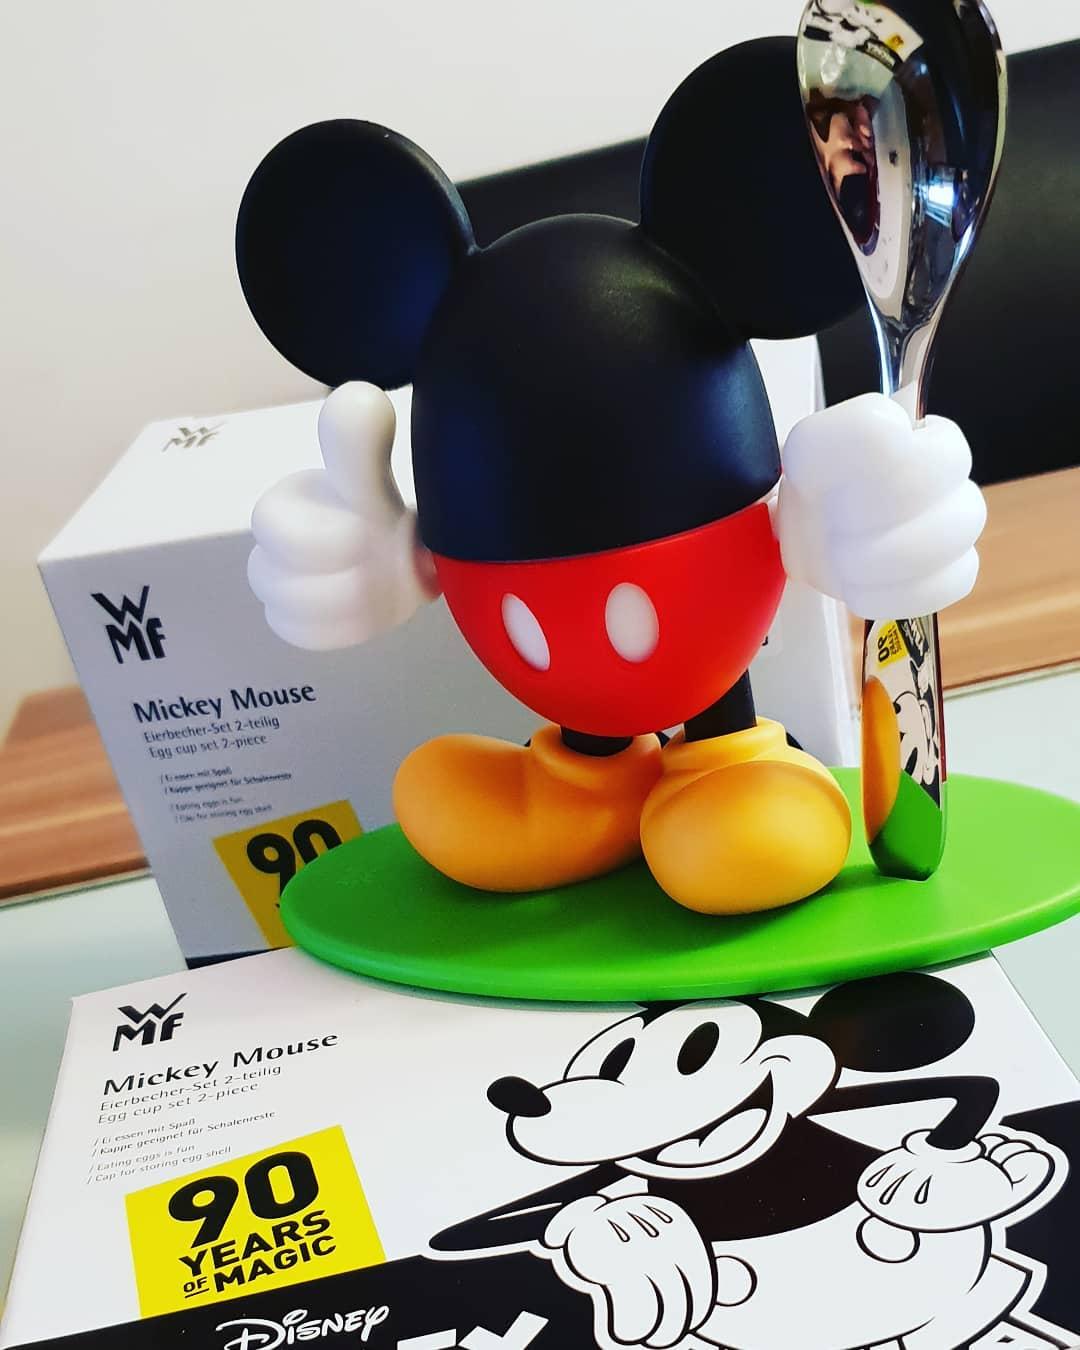 #mickeymouse #eierBecher #90yearsofmickey @wmf_austria #disney #breakfast #happybirthdaymickey